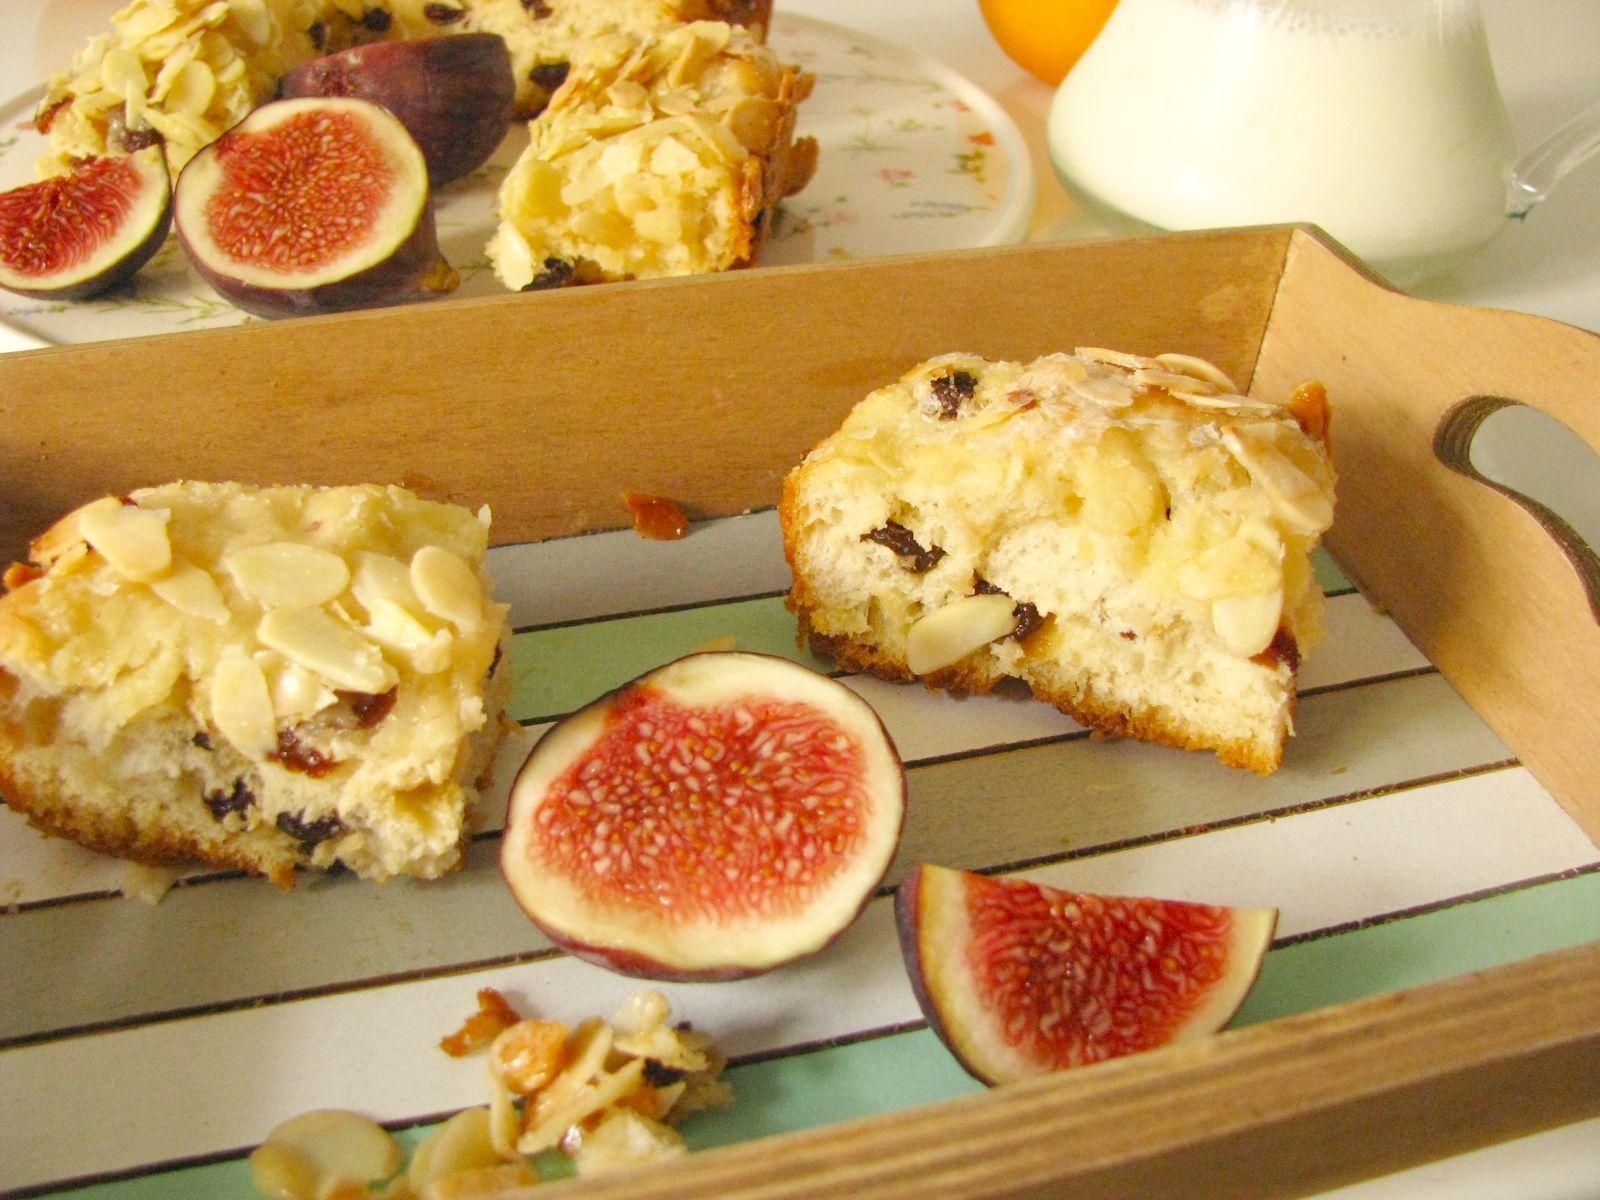 Maslovy kolac na ranajky s hrozienkami a mandlami